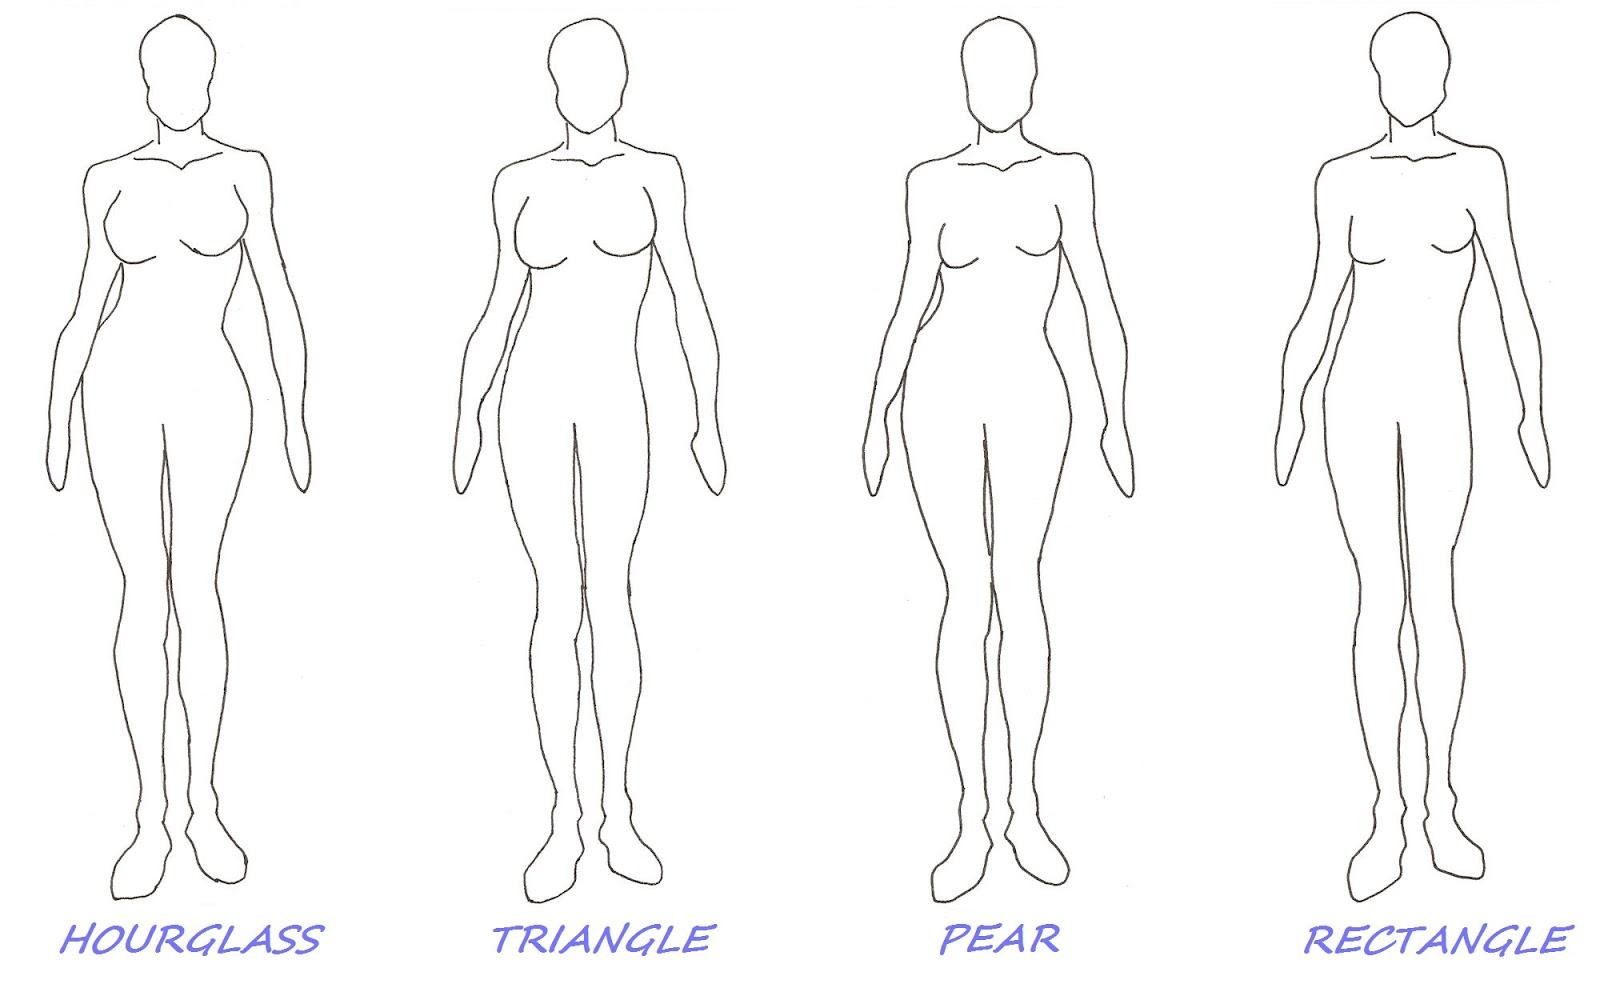 http://2.bp.blogspot.com/-akWrdRFz1FY/UQQonszXiWI/AAAAAAAAFbk/wZwOkvt8kks/s1600/body-type-for-dresses.jpg